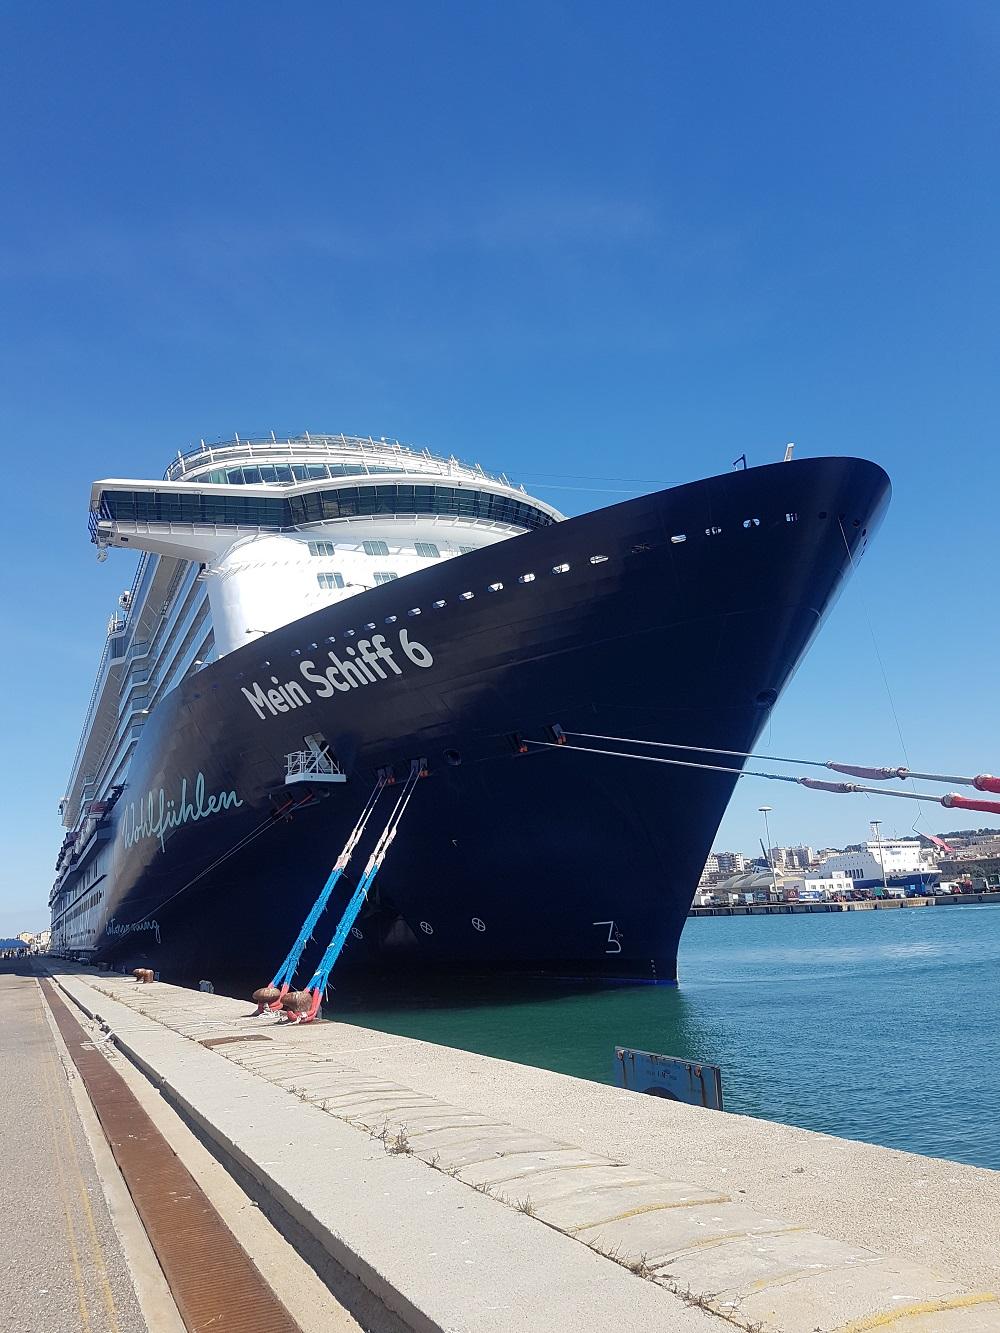 TUI Cruises Mein Schiff Kreuzfahrt Reisebericht Vieweg